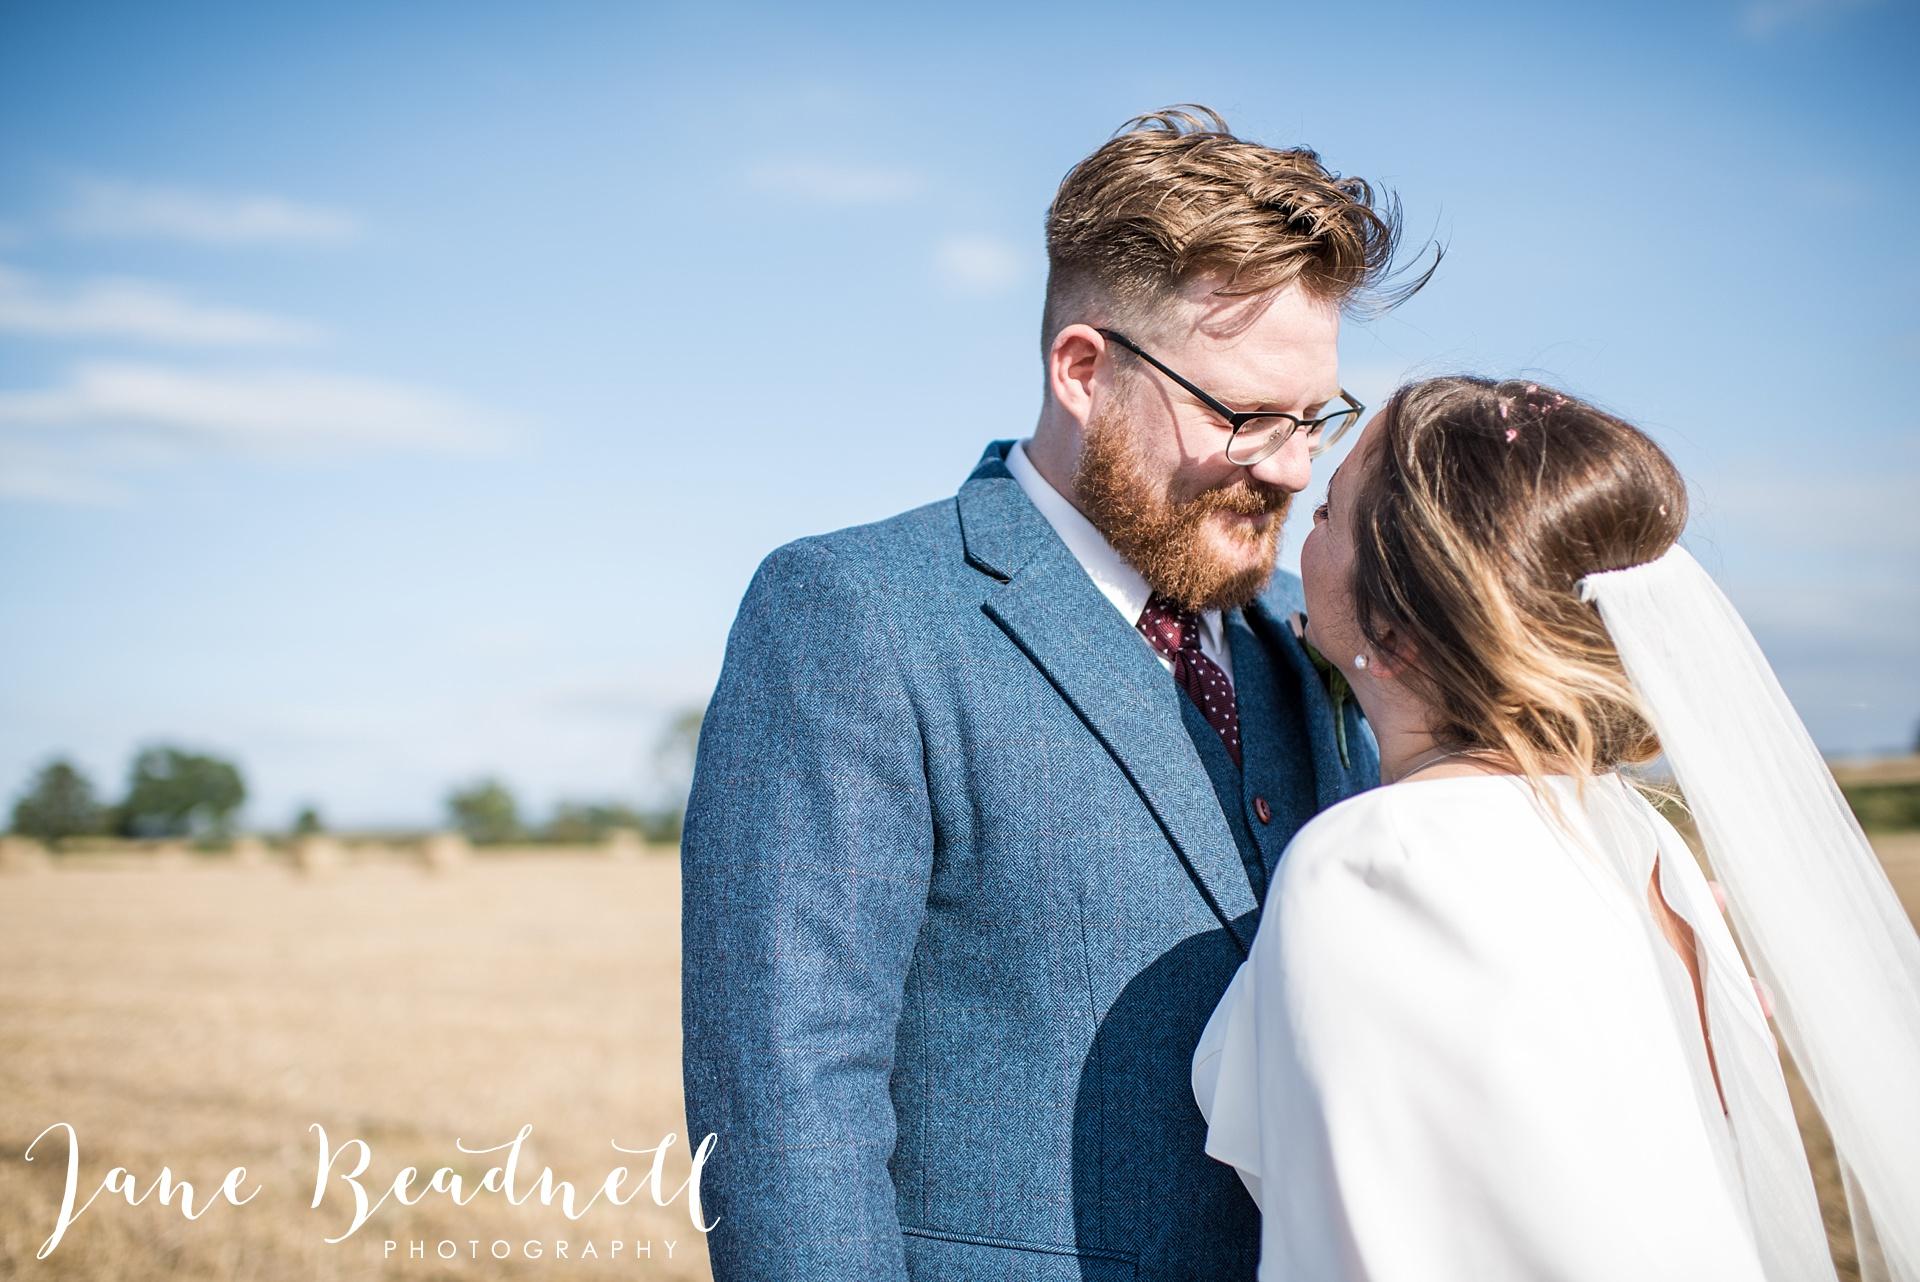 fine-art-wedding-photographer-jane-beadnell-yorkshire-wedding-photographer_0068